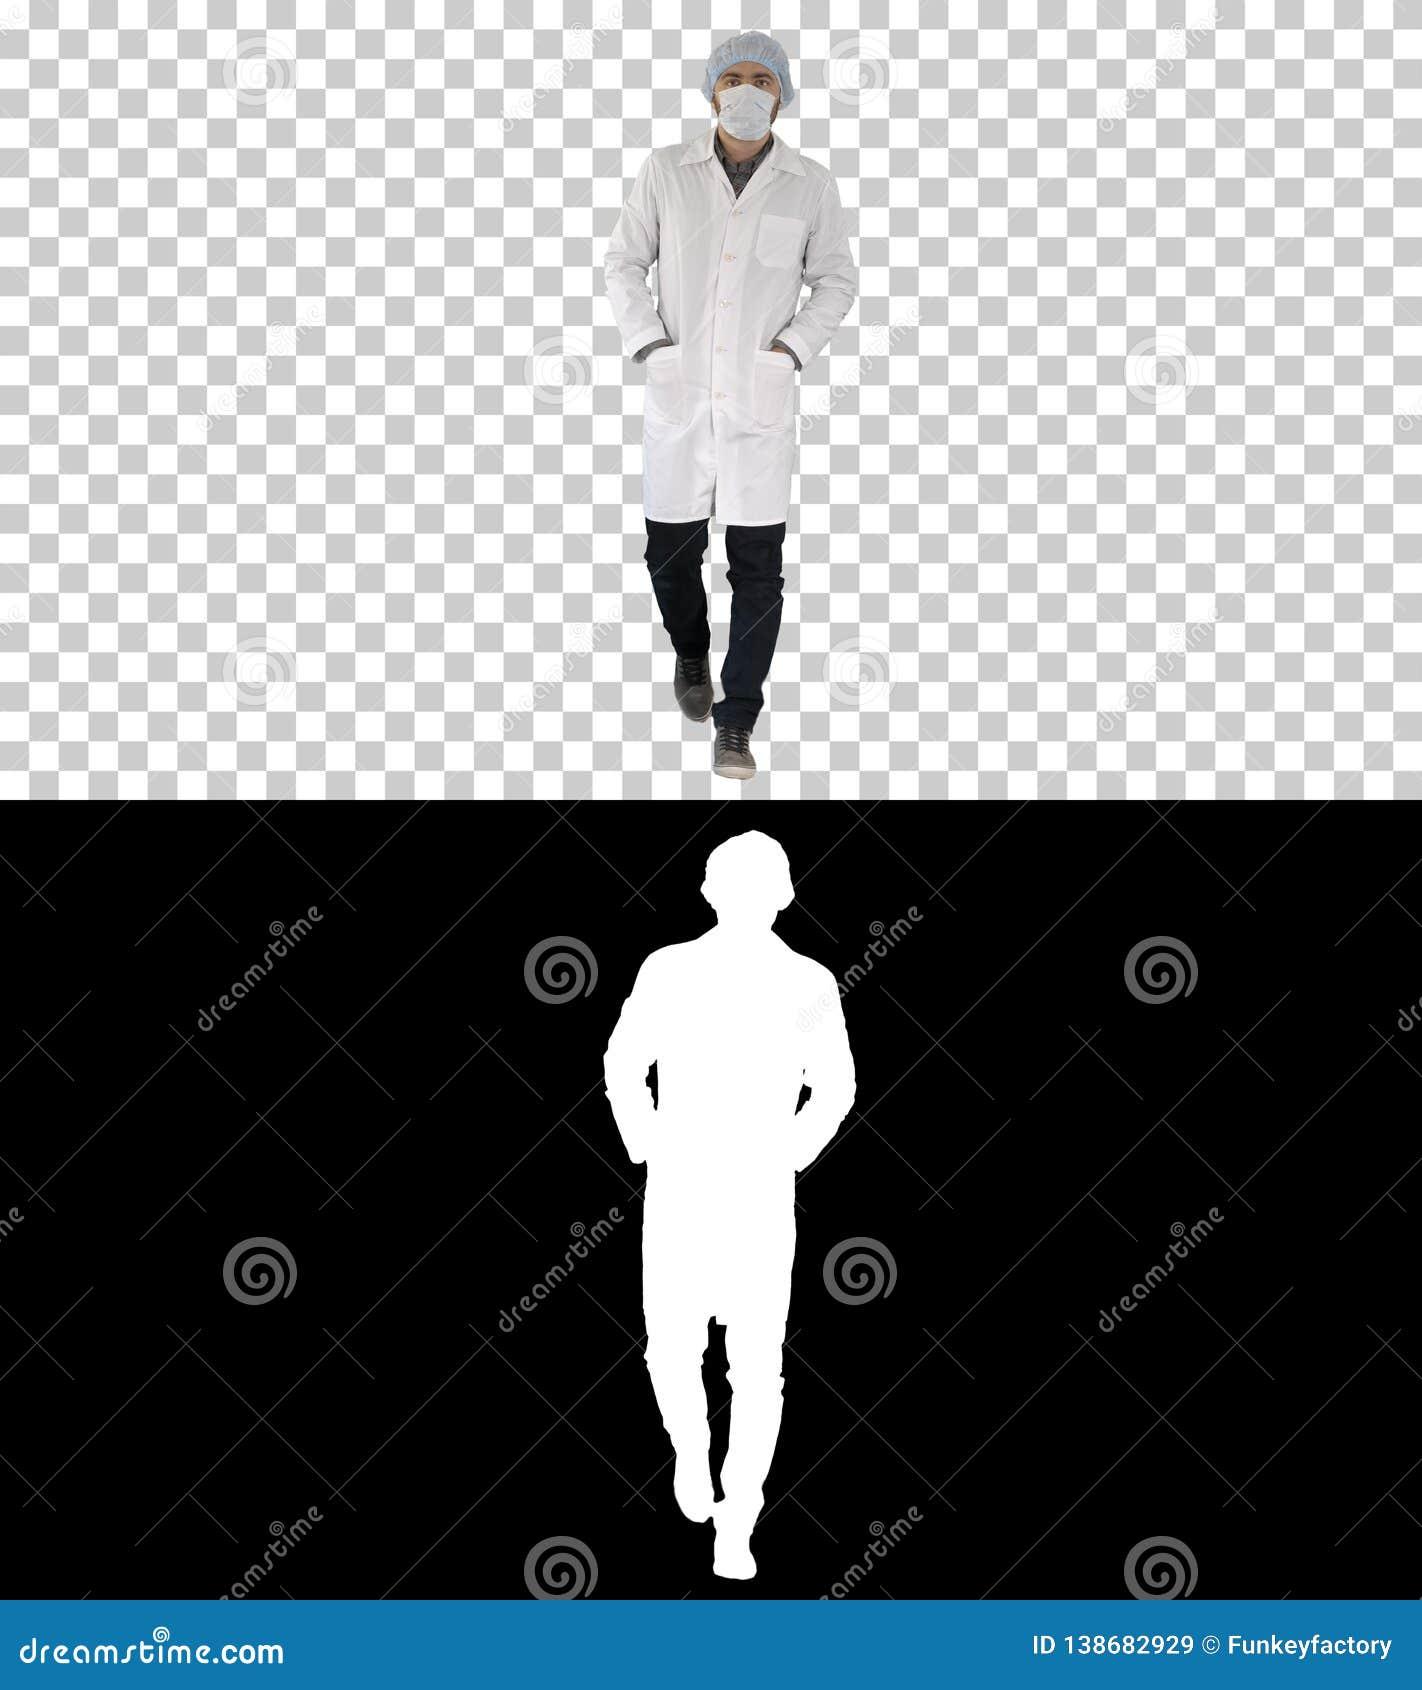 Doctor de sexo masculino joven que camina que lleva la máscara quirúrgica, Alpha Channel